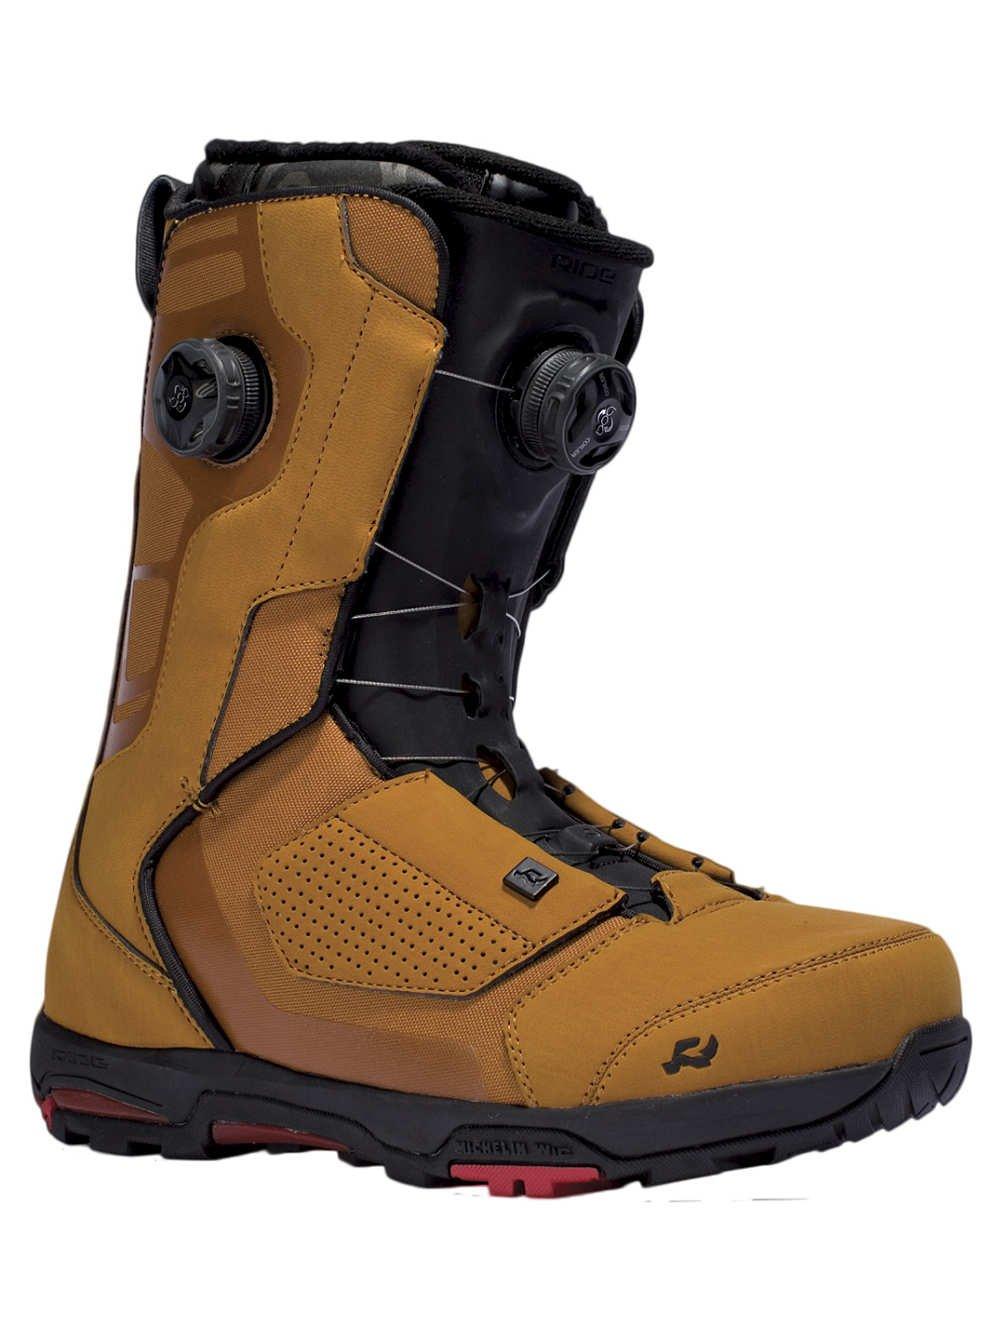 Ride Insano Focus Boa Snowboard Boots 2016 - 9.5  Amazon.ca  Sports    Outdoors 1cbaf76e5